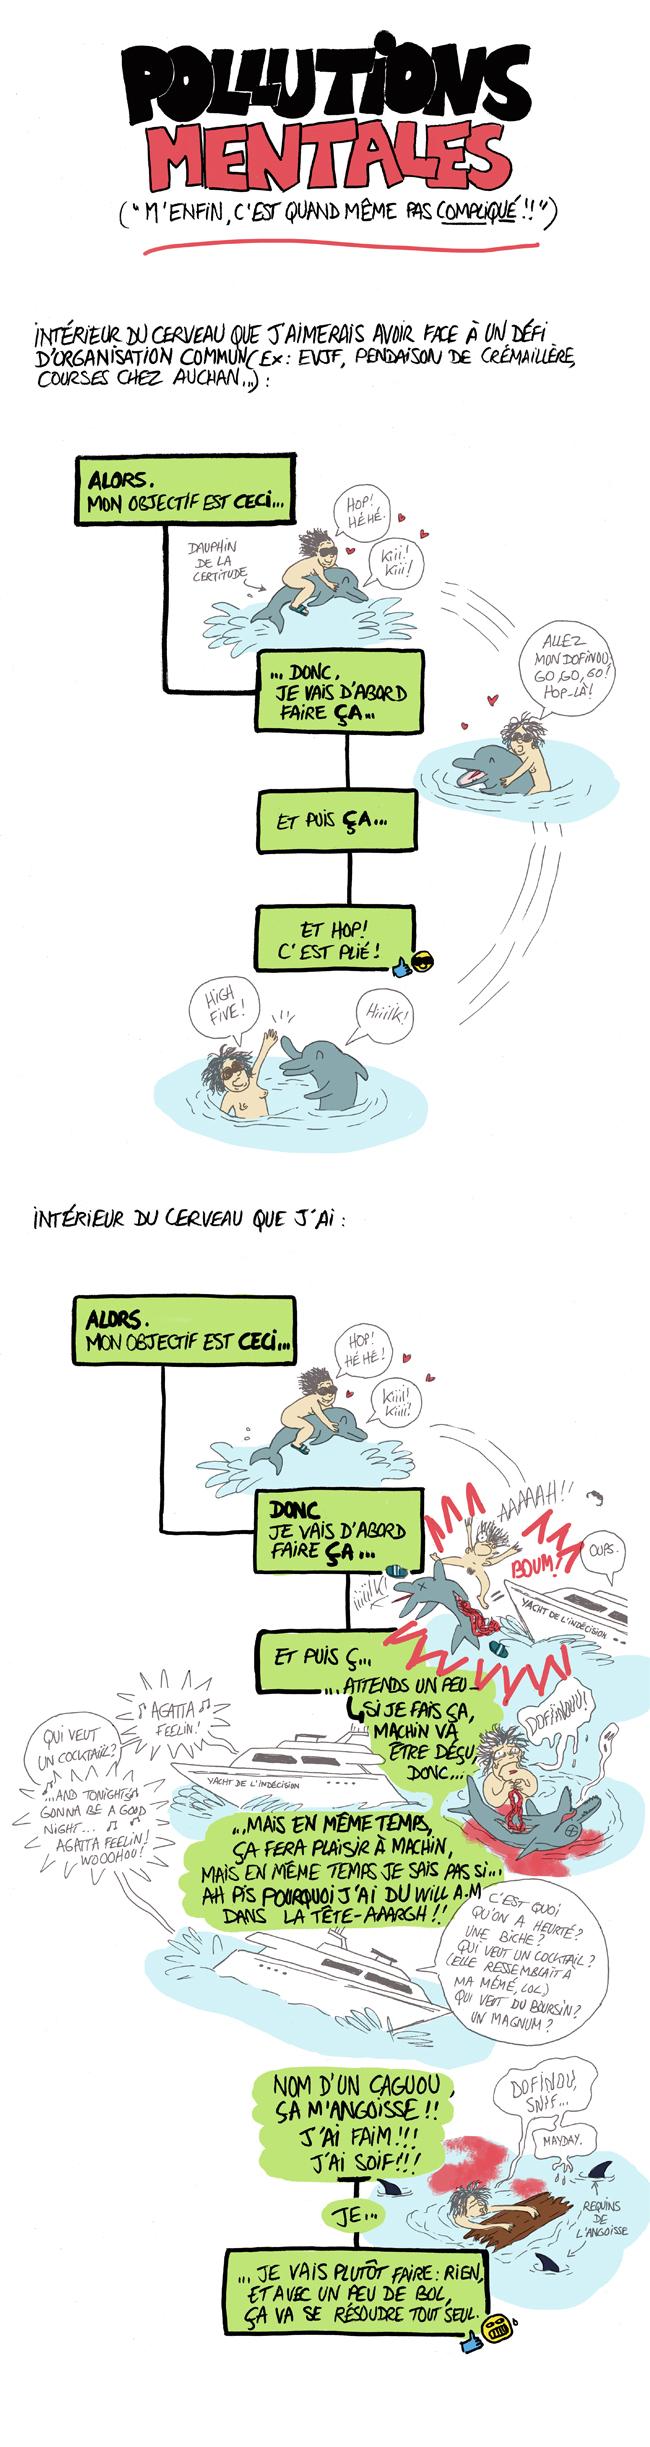 PollutionsMentales2